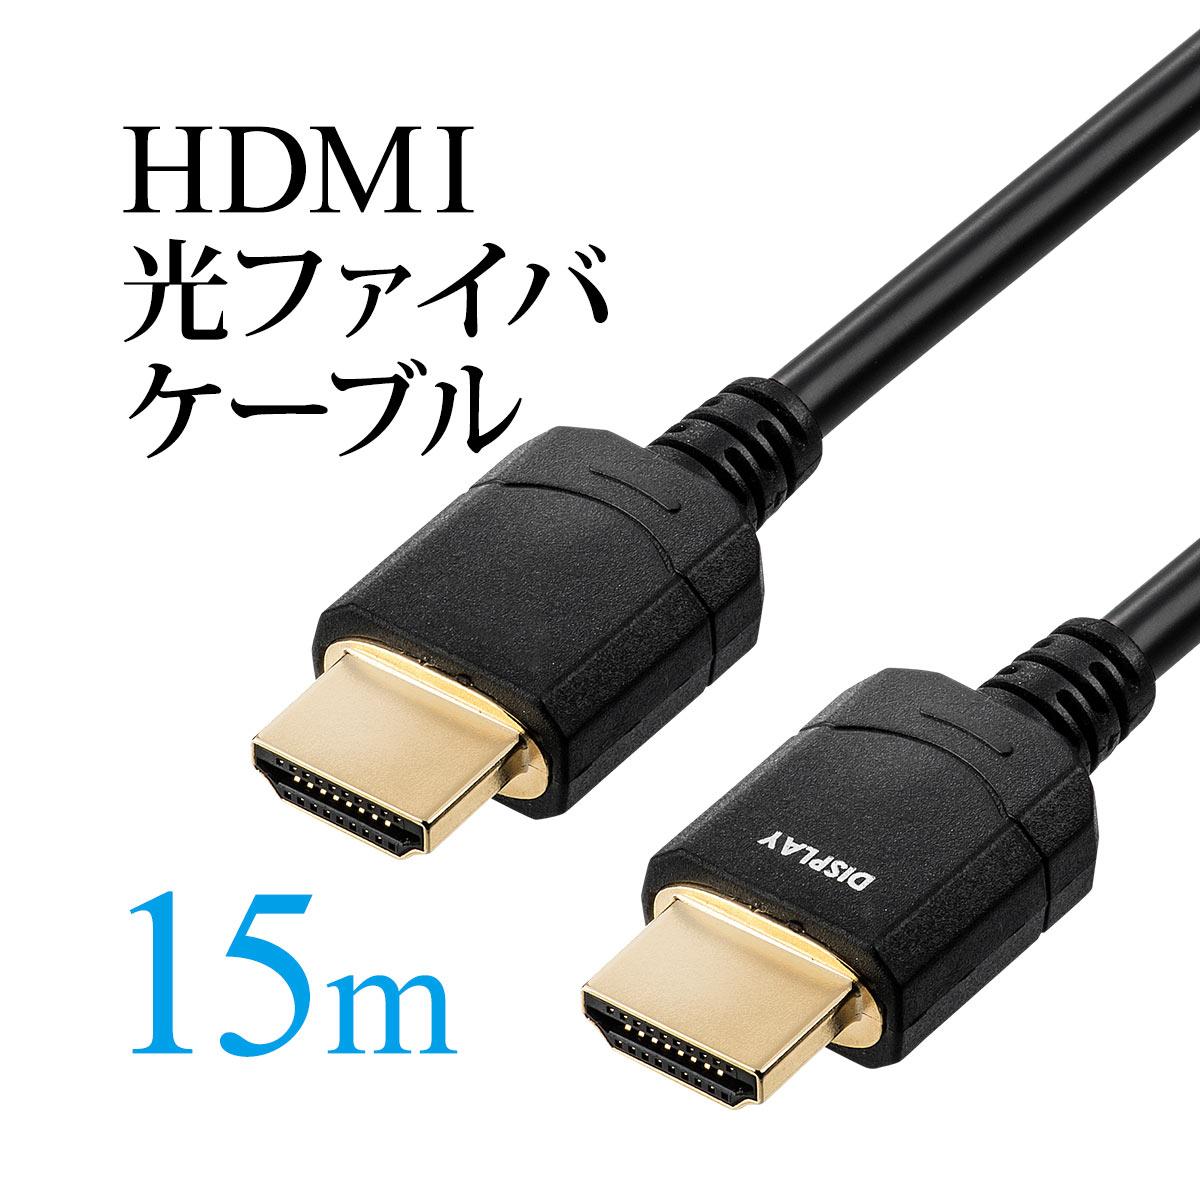 HDMI光ファイバケーブル 15m 4K/60Hz 18Gbps HDR対応 バージョン2.0準拠品 ブラック HDMIケーブル 光ファイバー[500-HD021-15]【サンワダイレクト限定品】【送料無料】